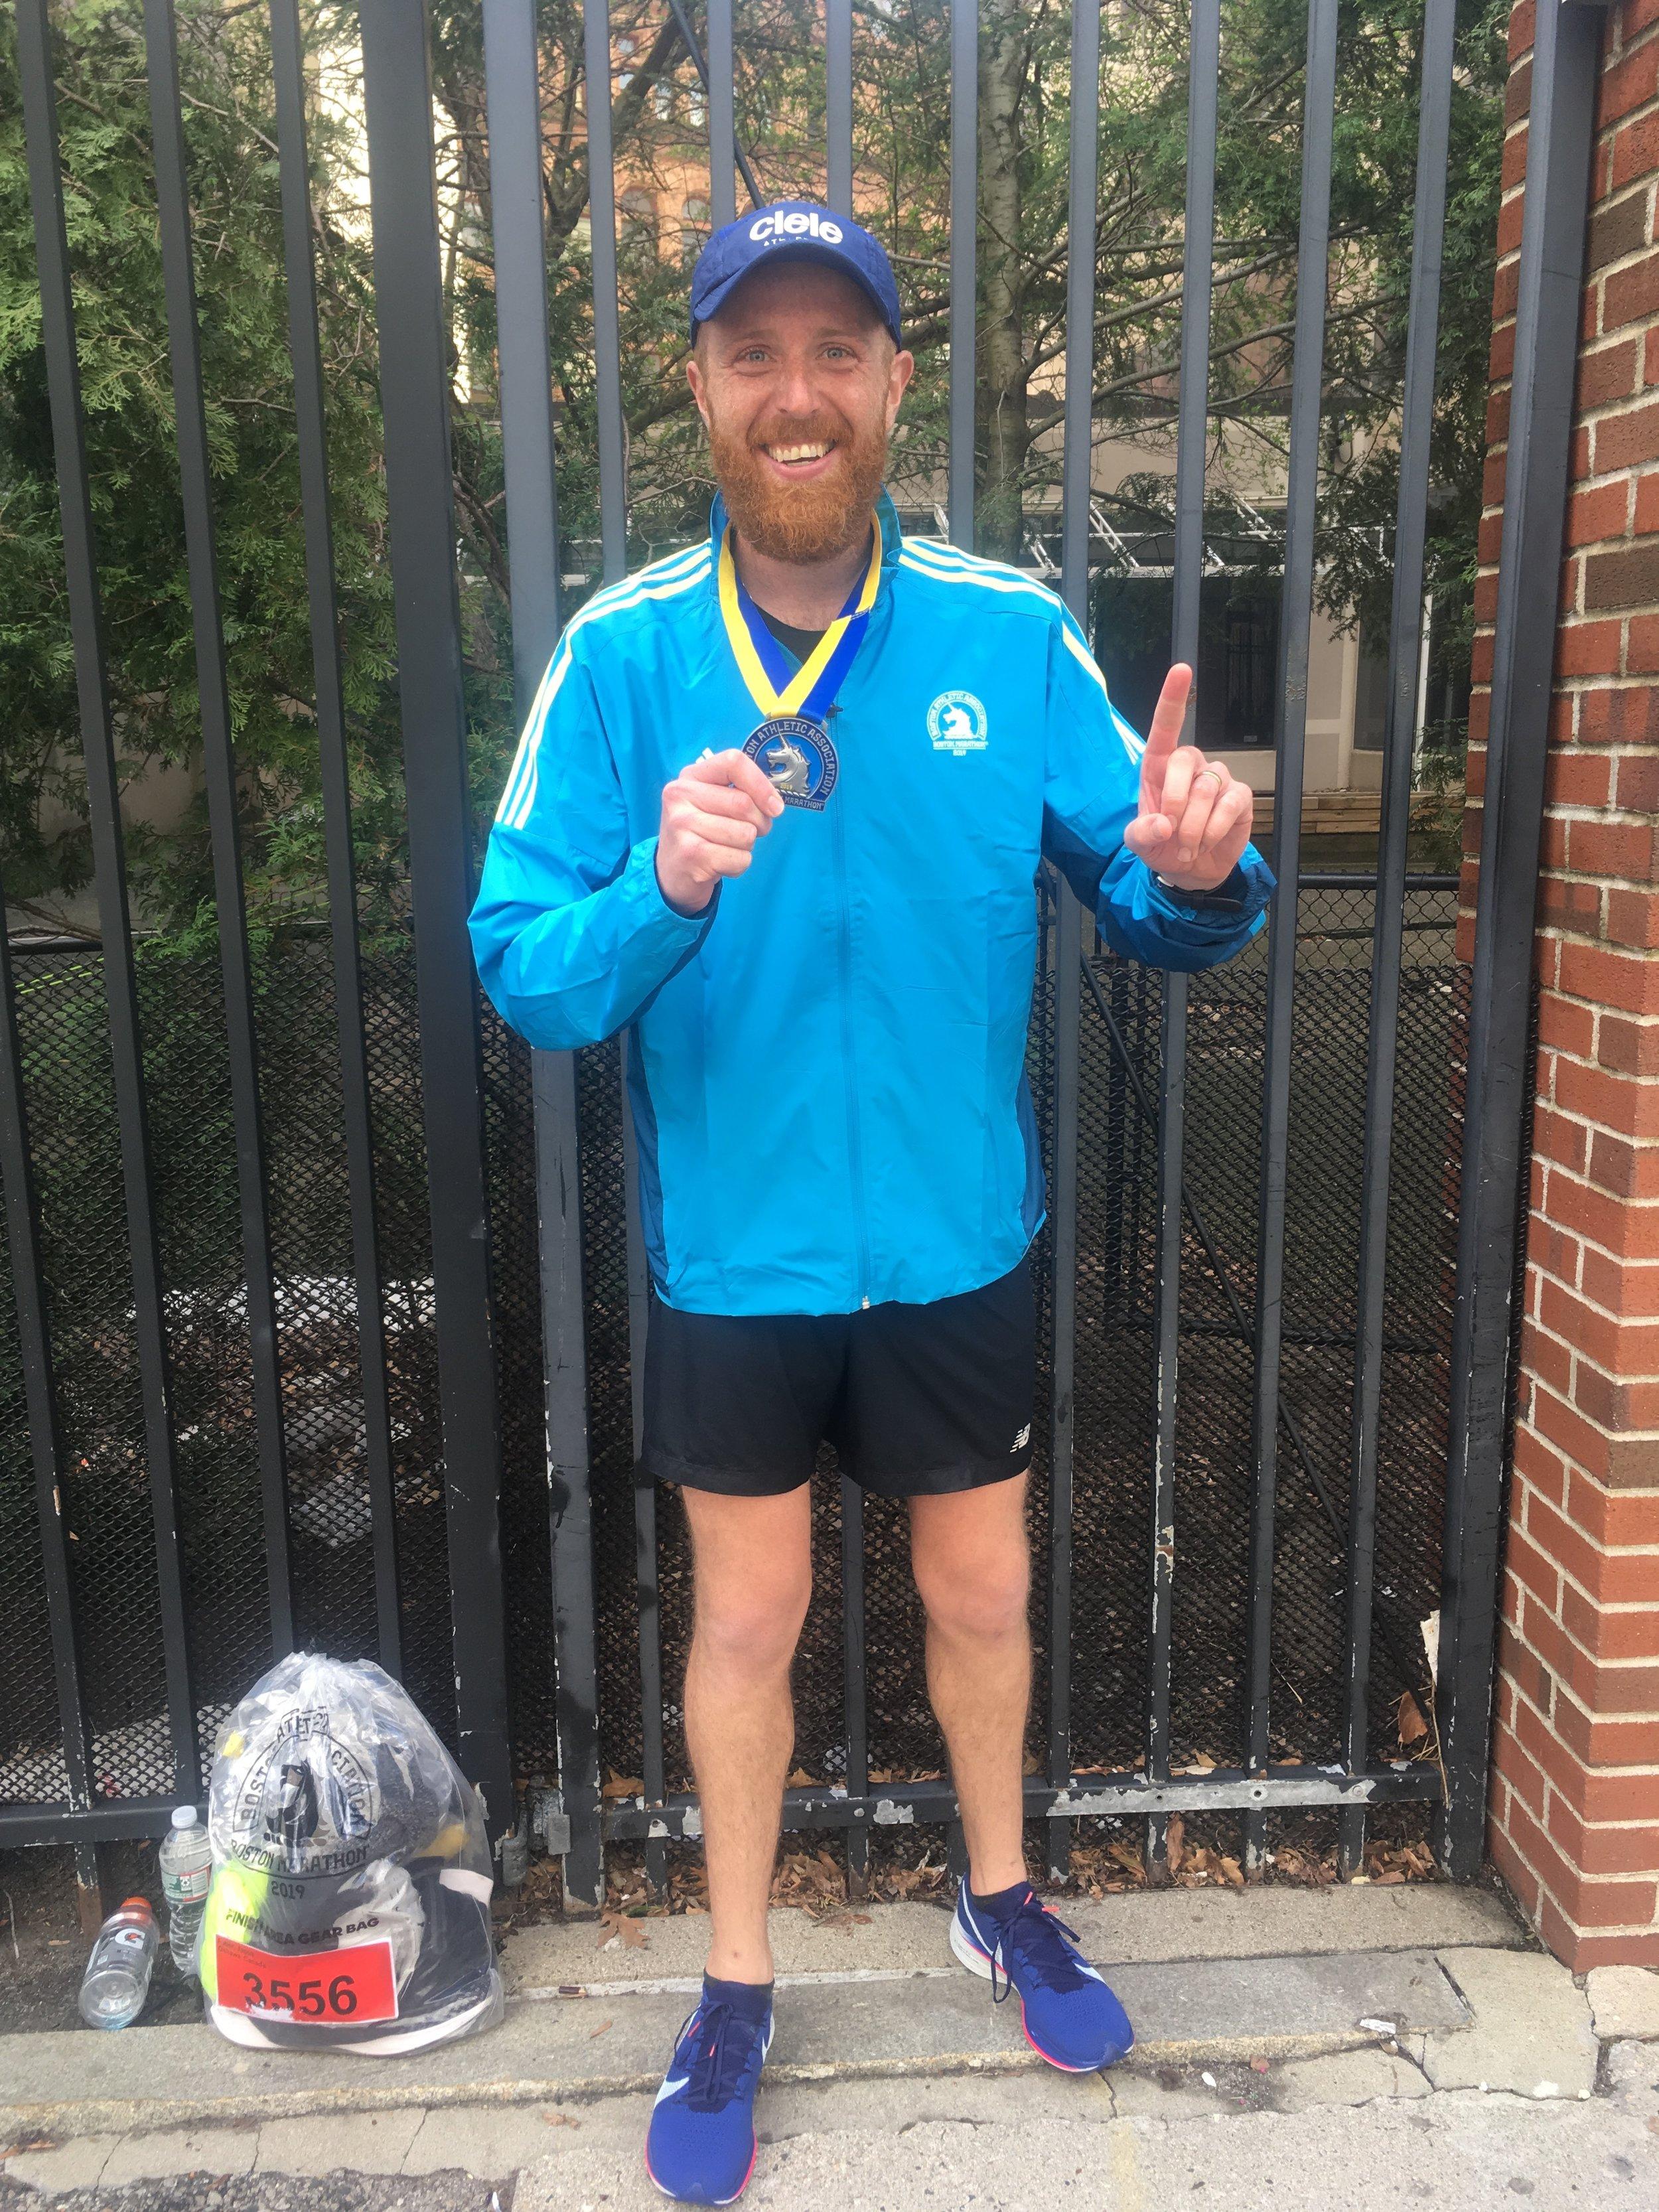 postrace-medal-boston.JPG